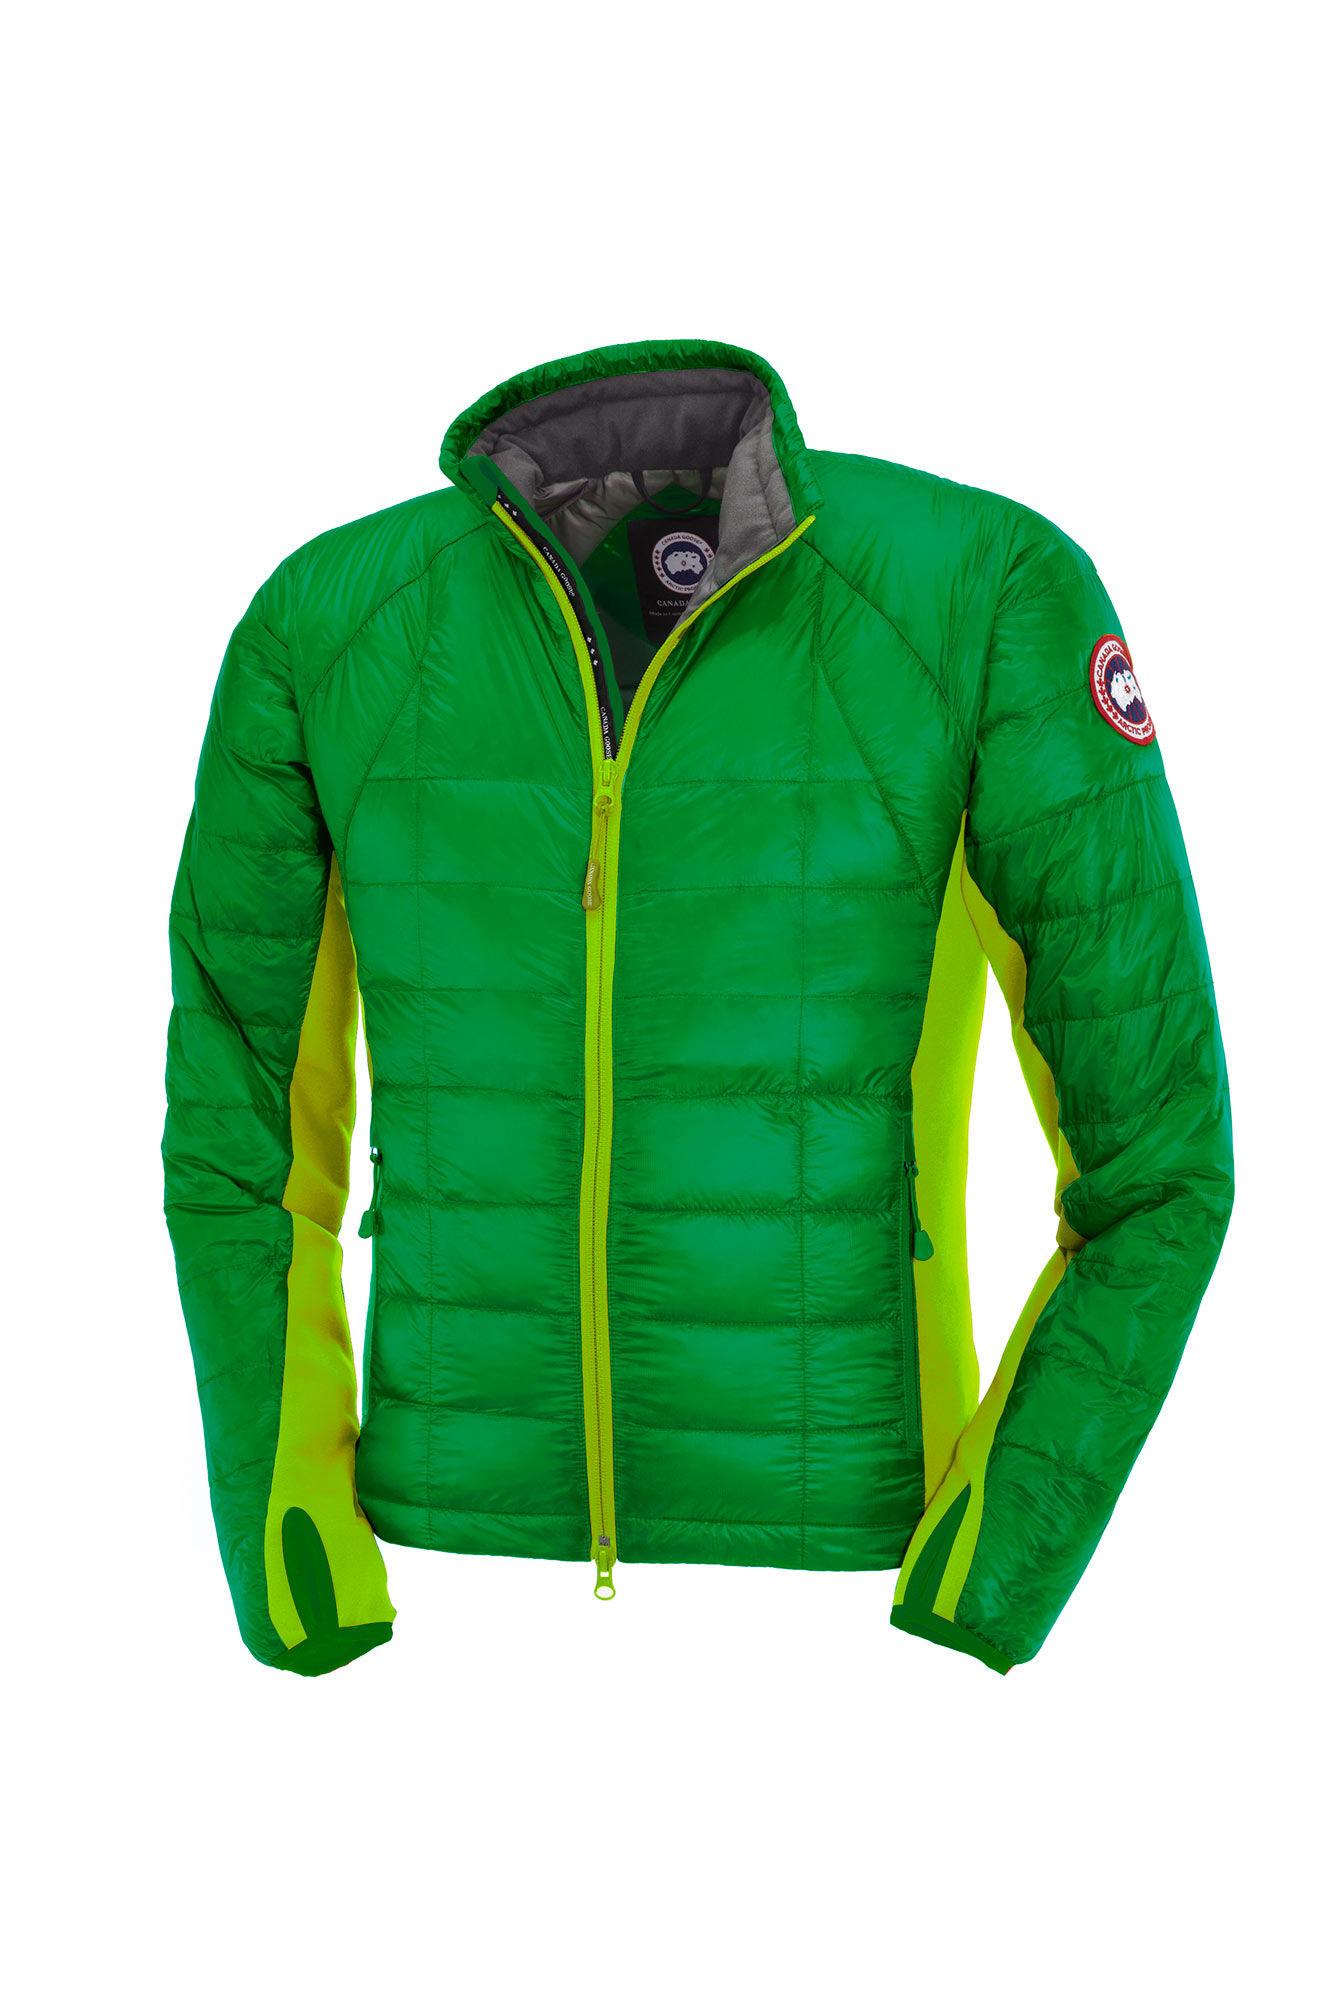 Canada Goose vest online official - Men's Canada Goose Hybridge Lite | Shop Men's Canada Goose ...